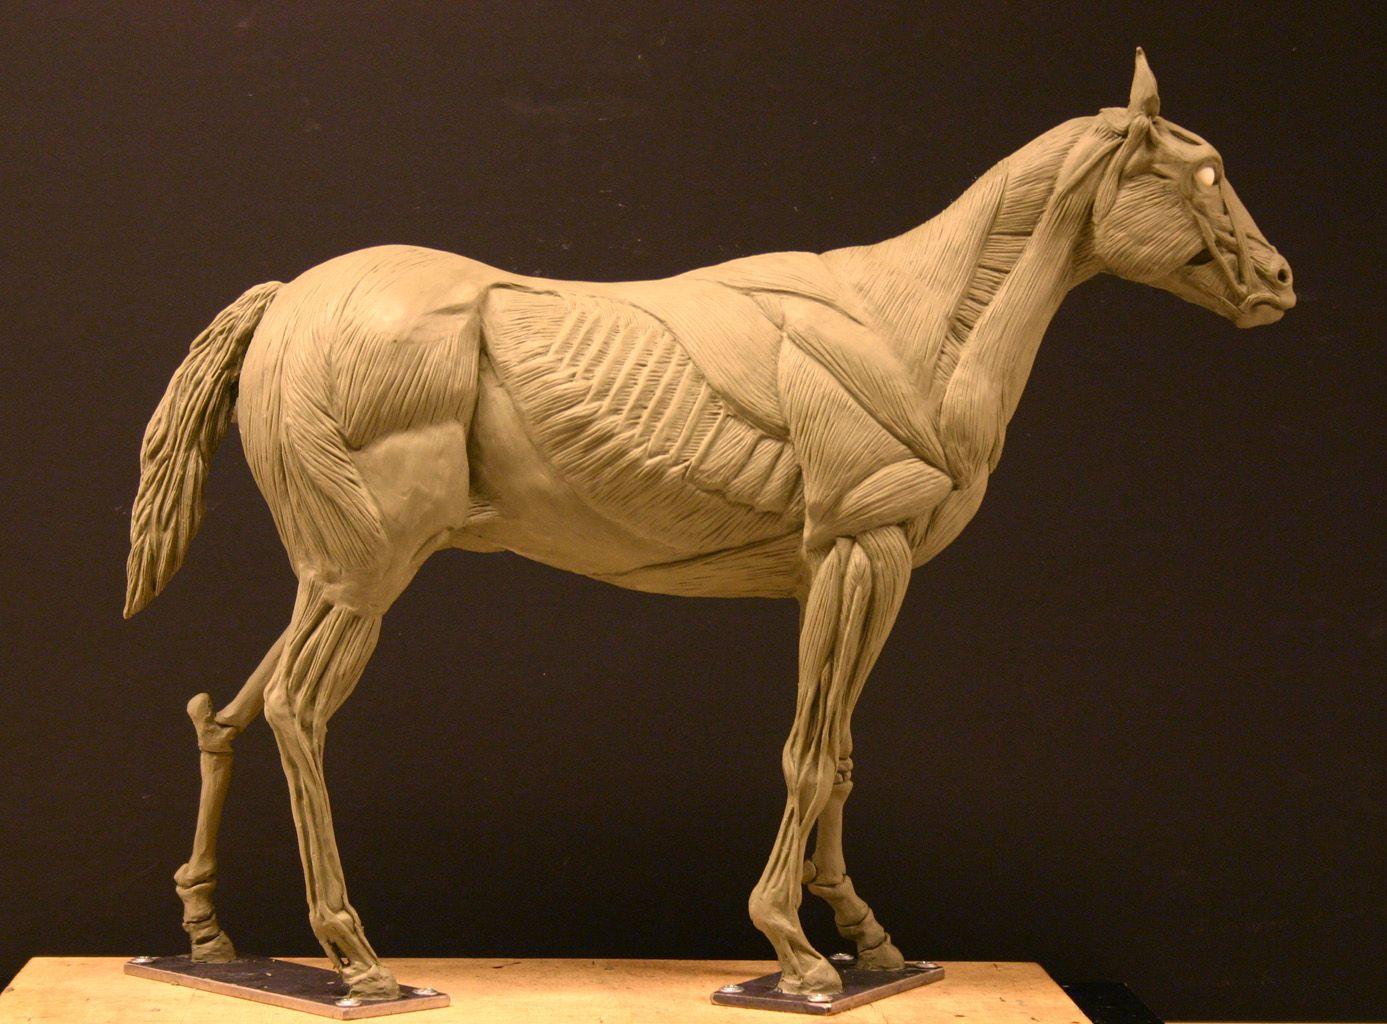 Horse anatomy artists pdf to jpg